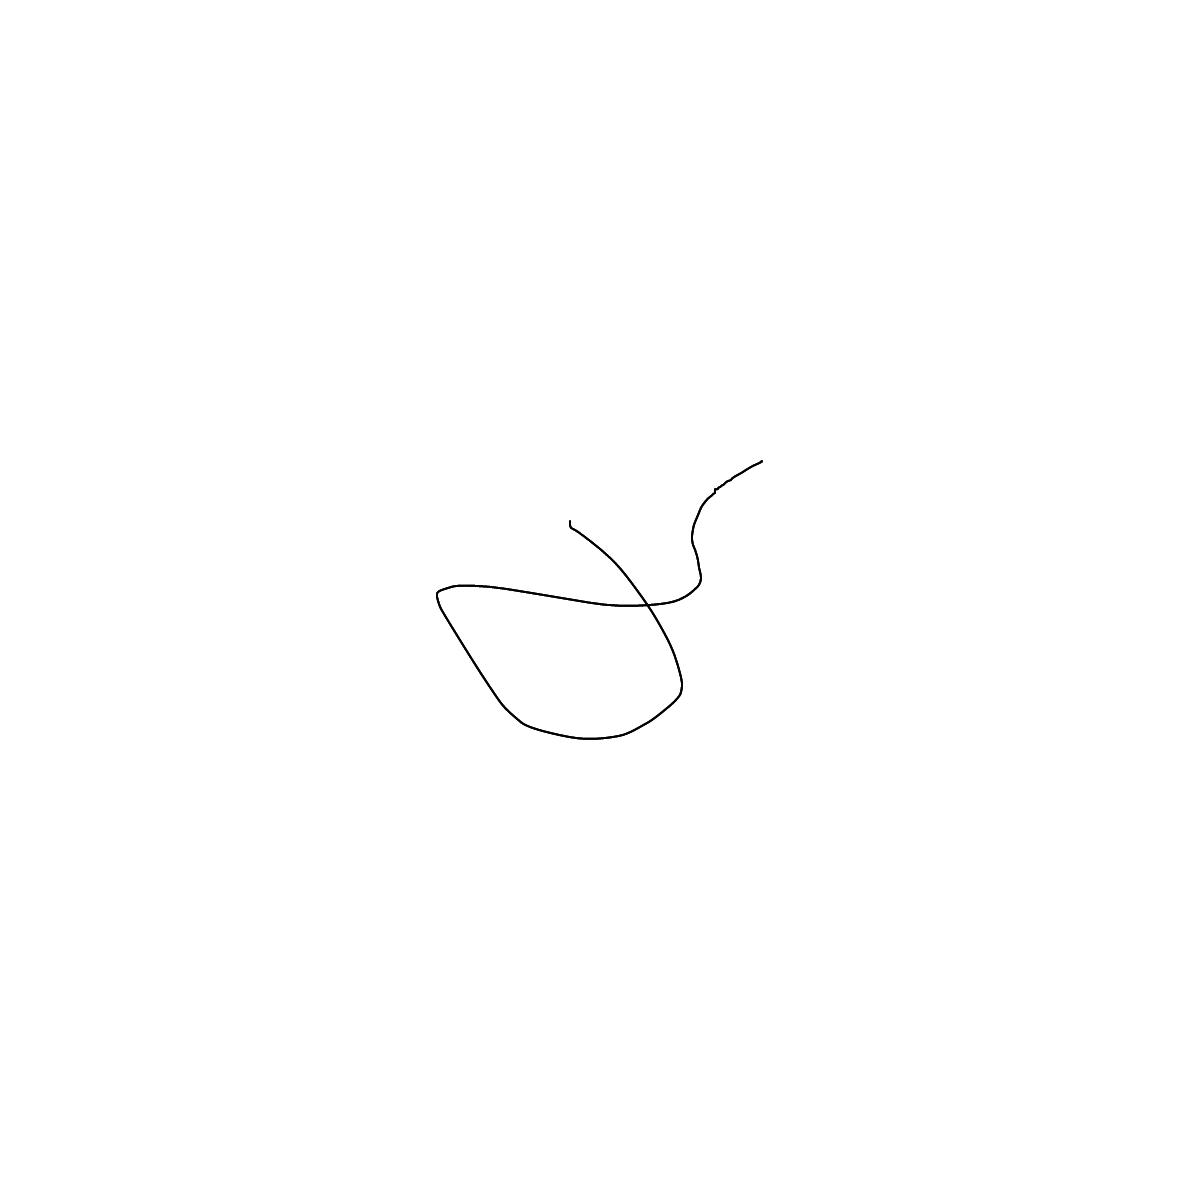 BAAAM drawing#24688 lat:50.9740295410156250lng: 1.8377686738967896